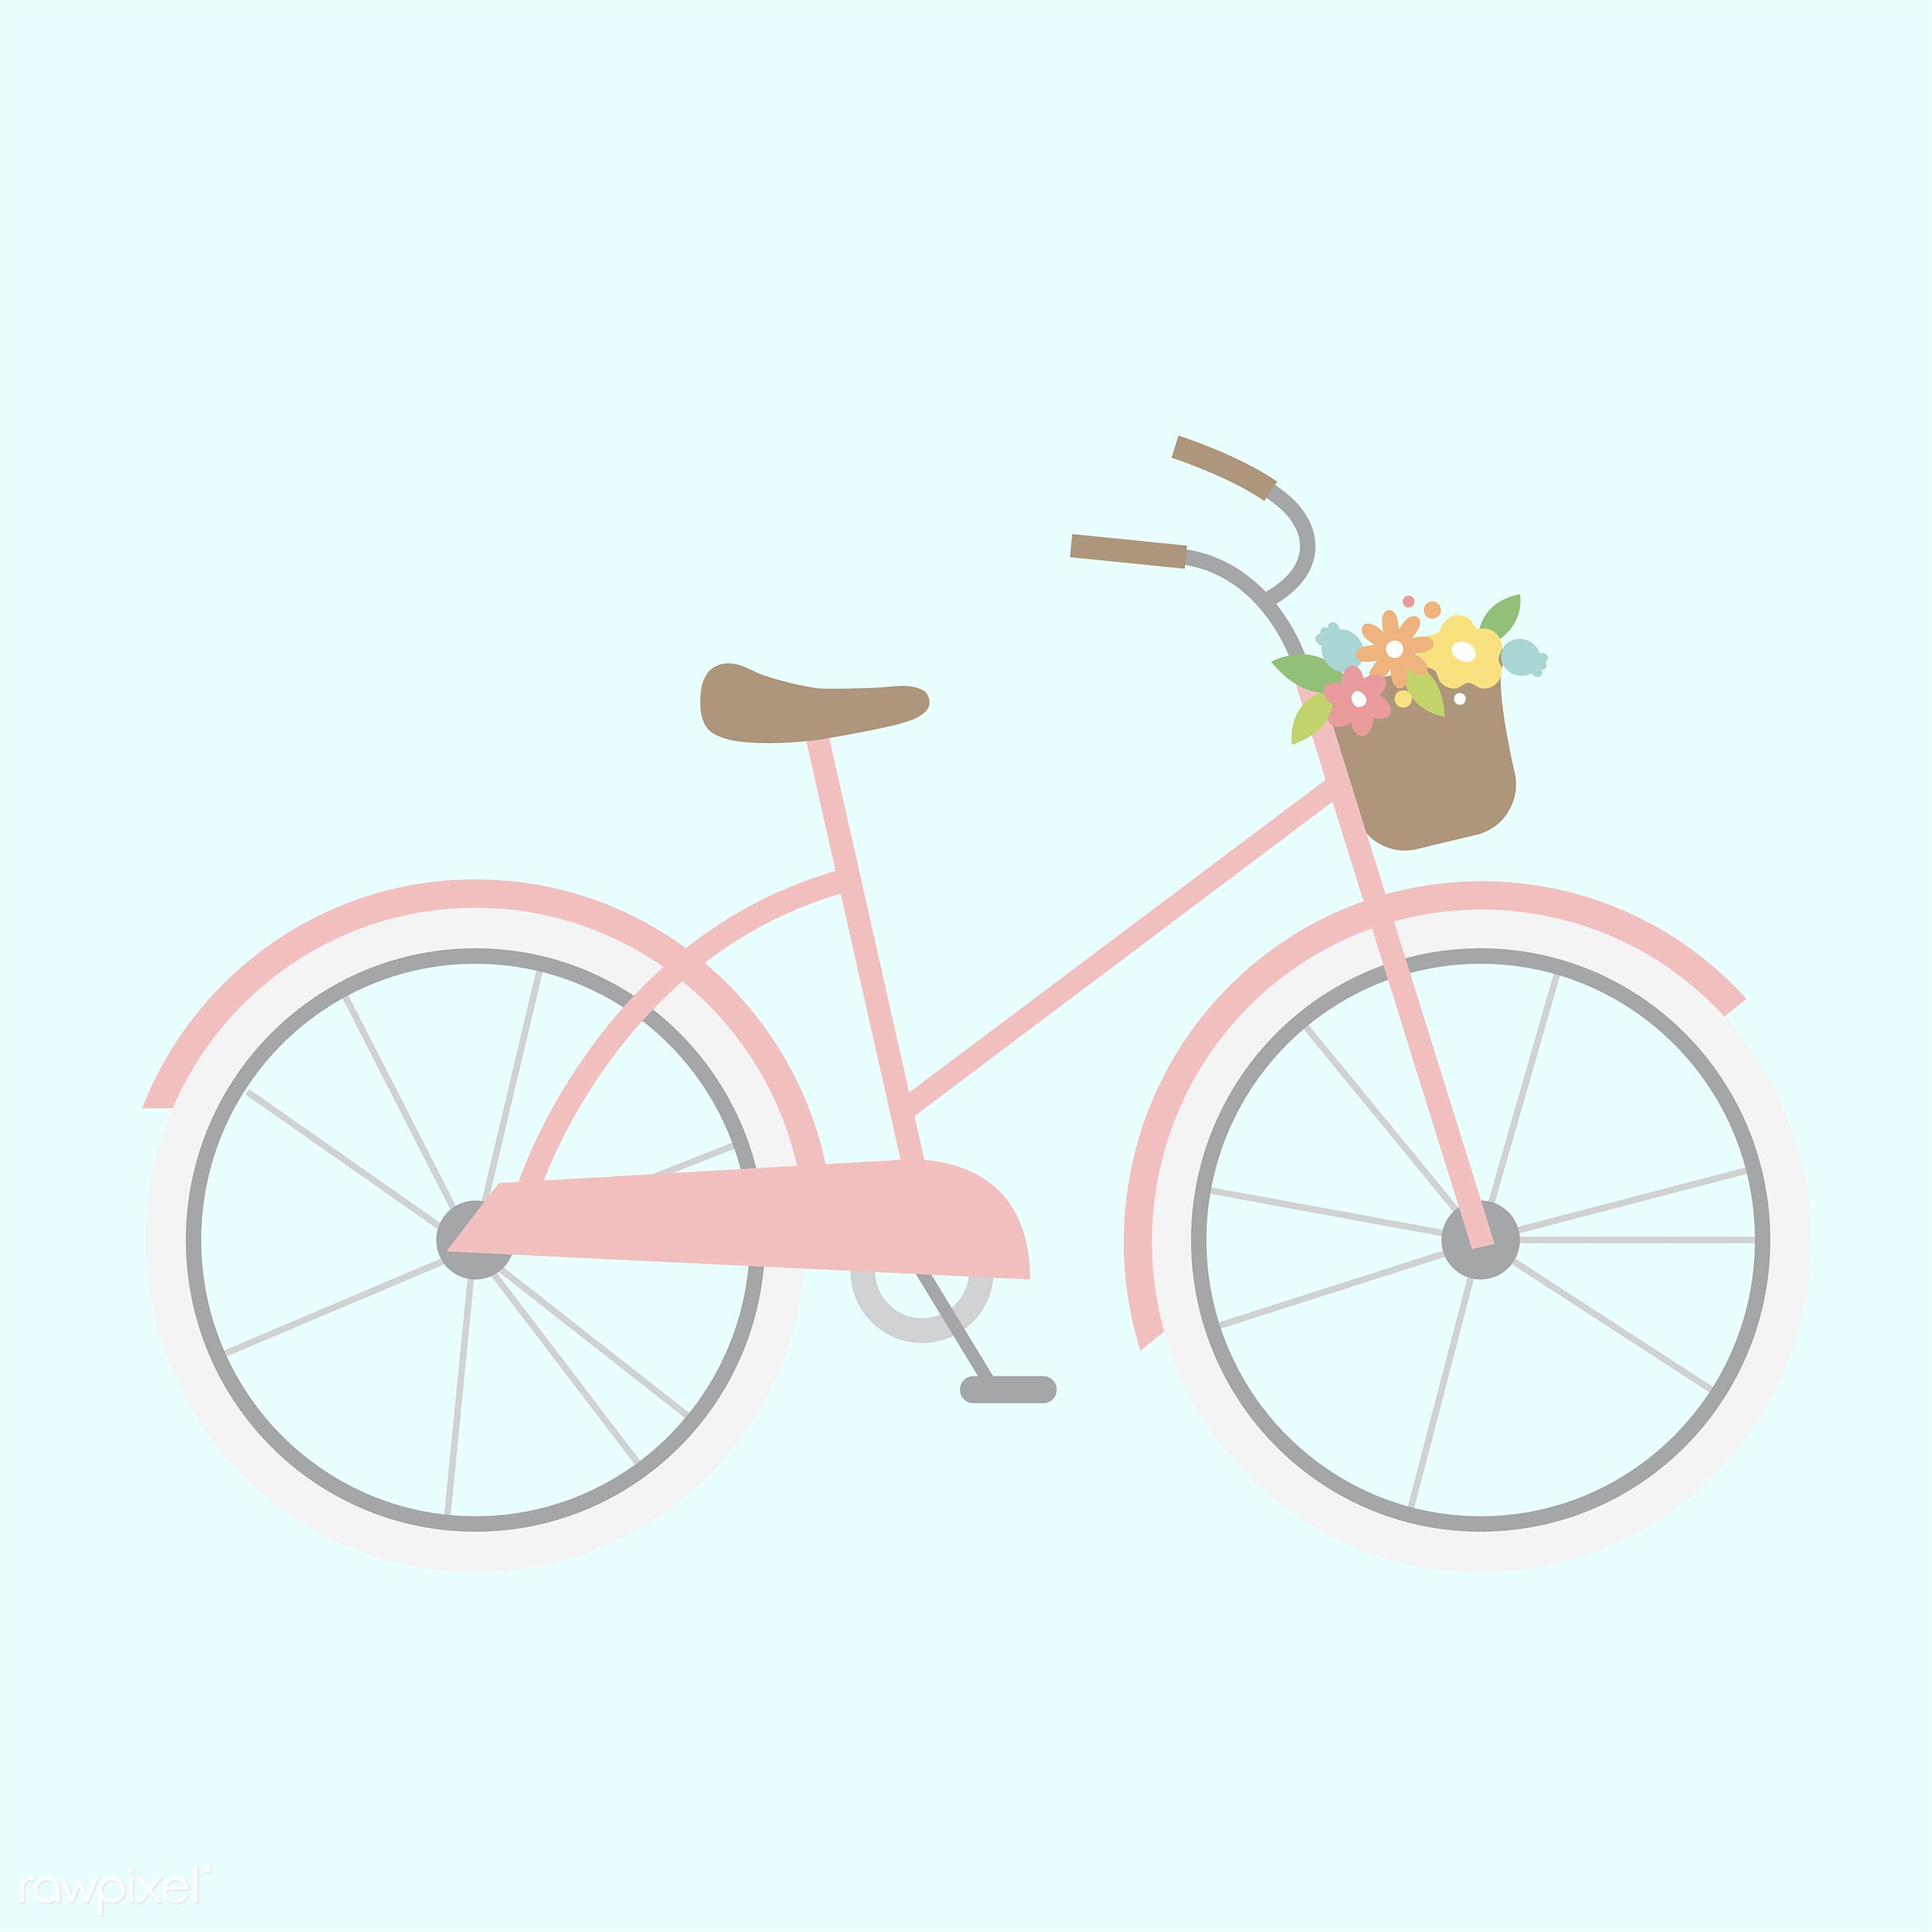 vector, illustration, graphic, cute, sweet, girly, pastel, bicycle, biking, cycling, bike